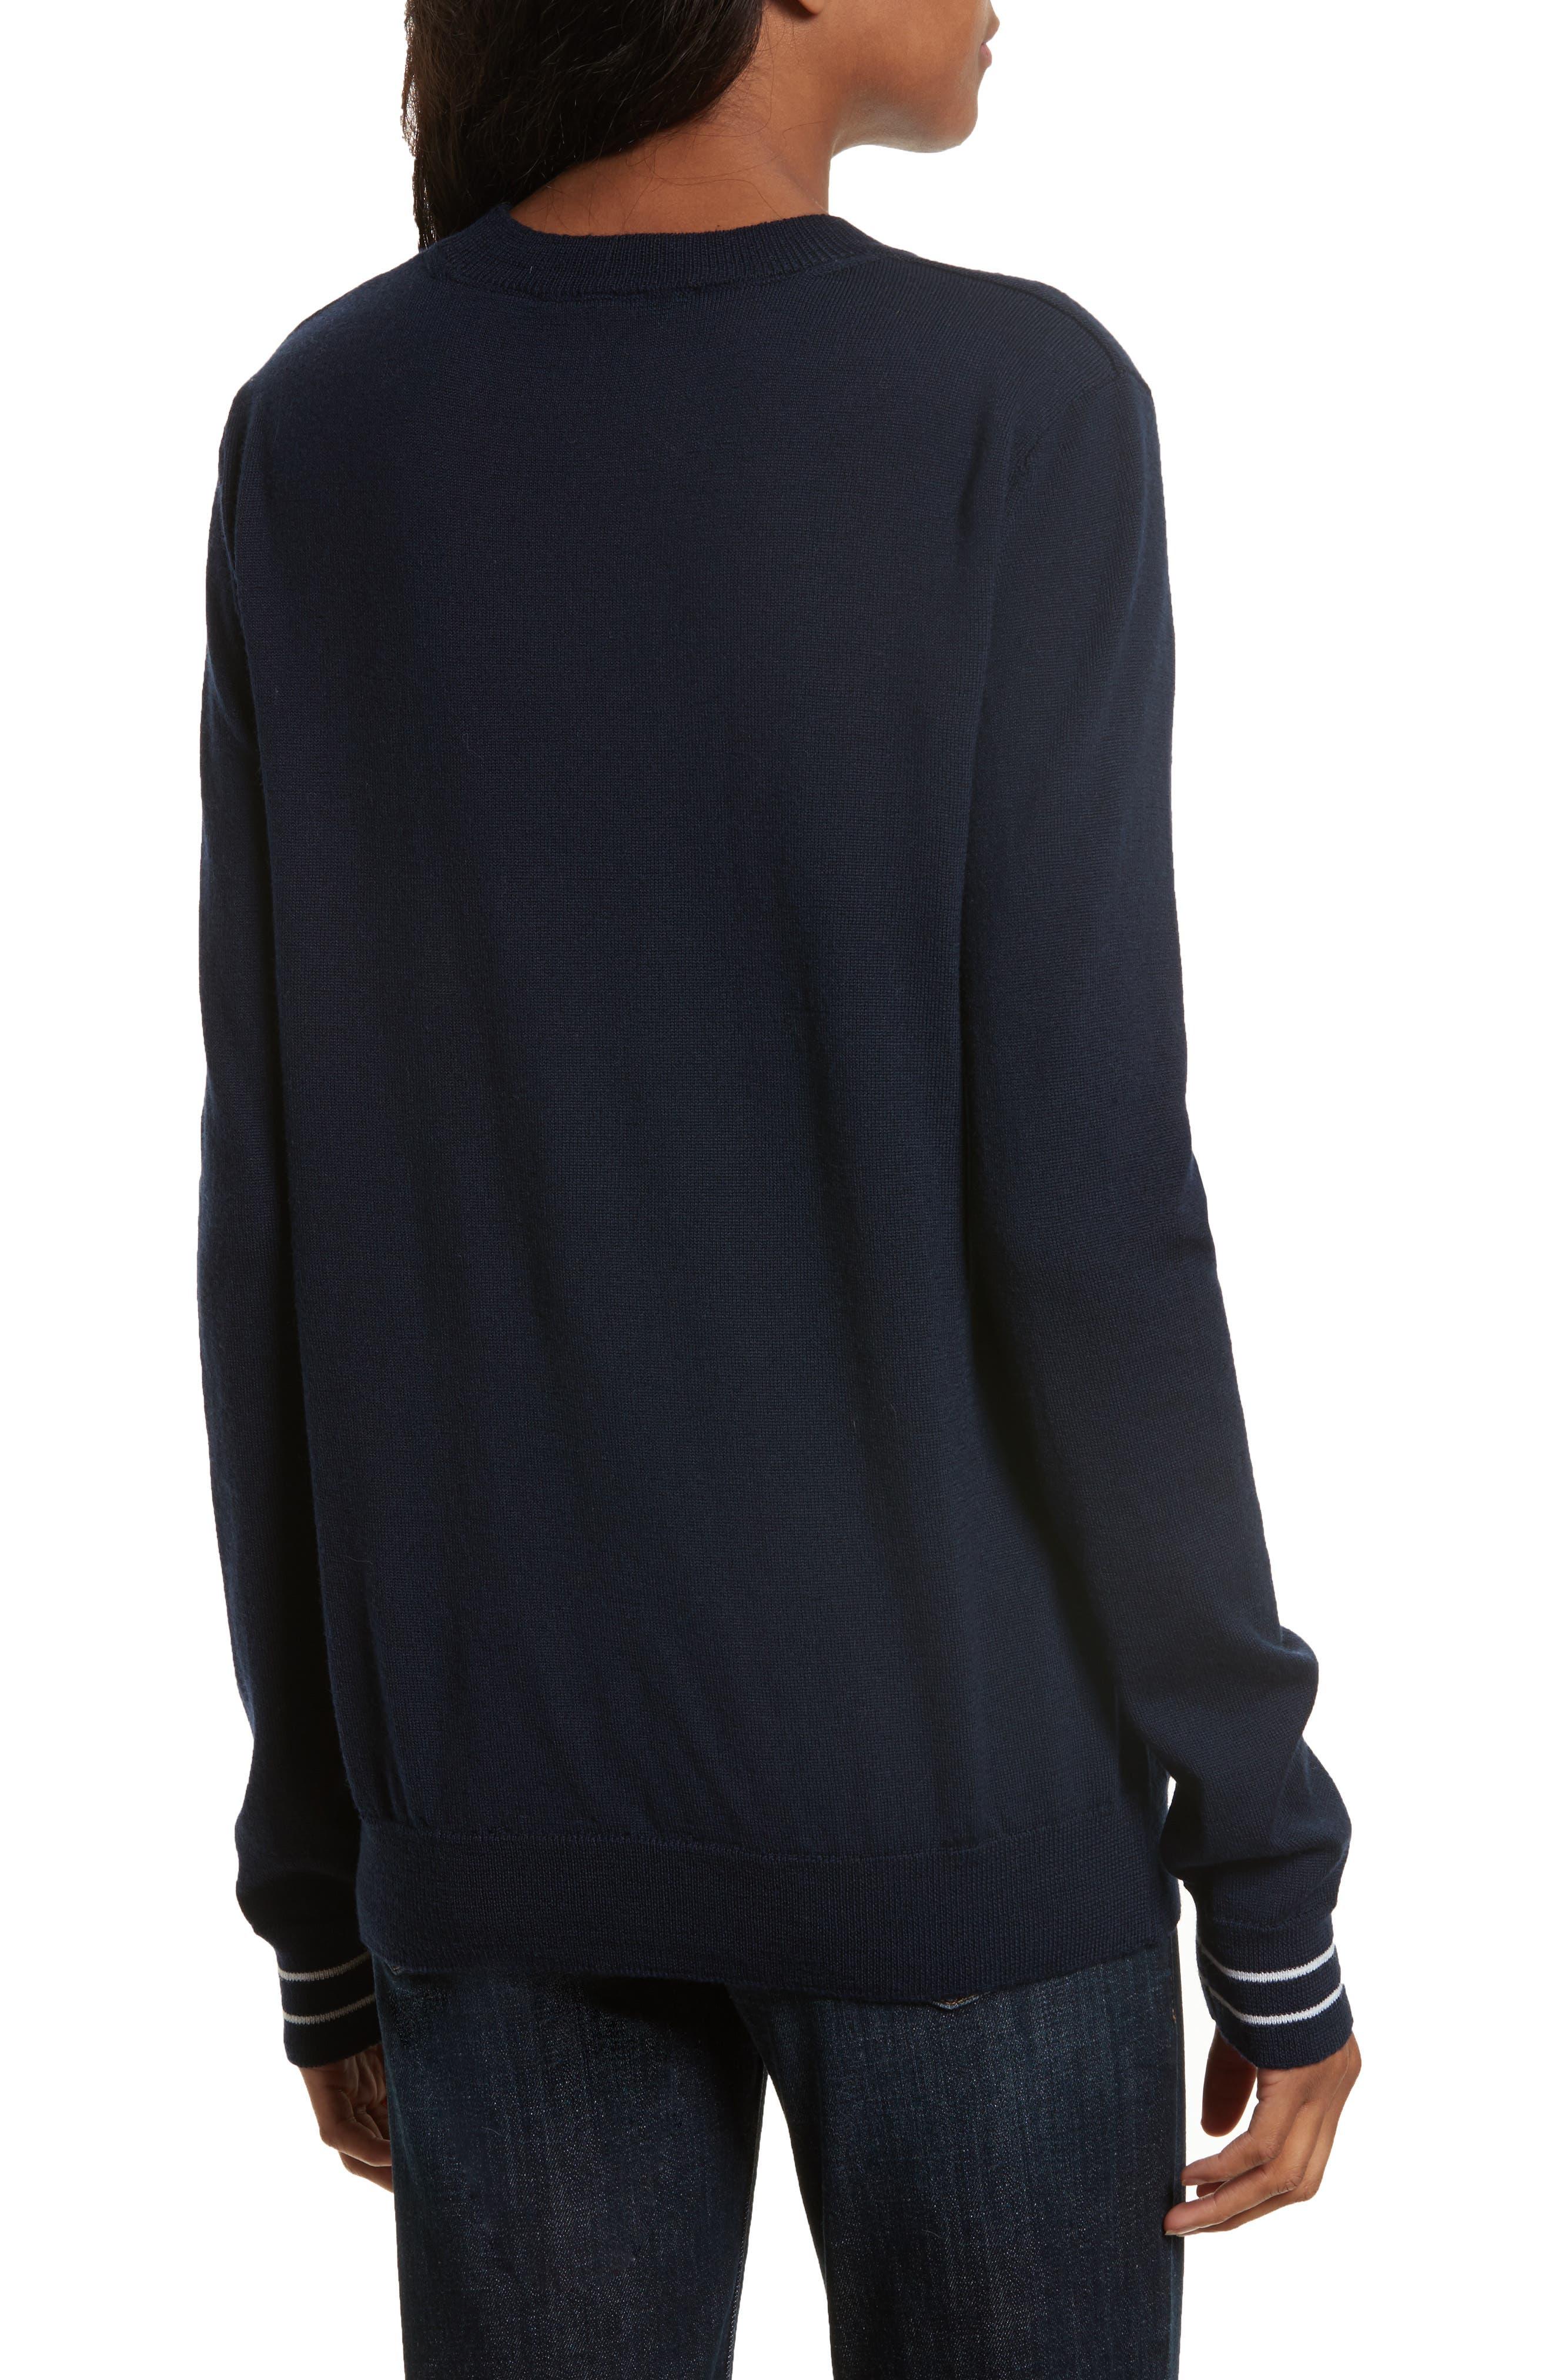 Alternate Image 2  - être cécile Boyfriend Knit Merino Wool Sweater